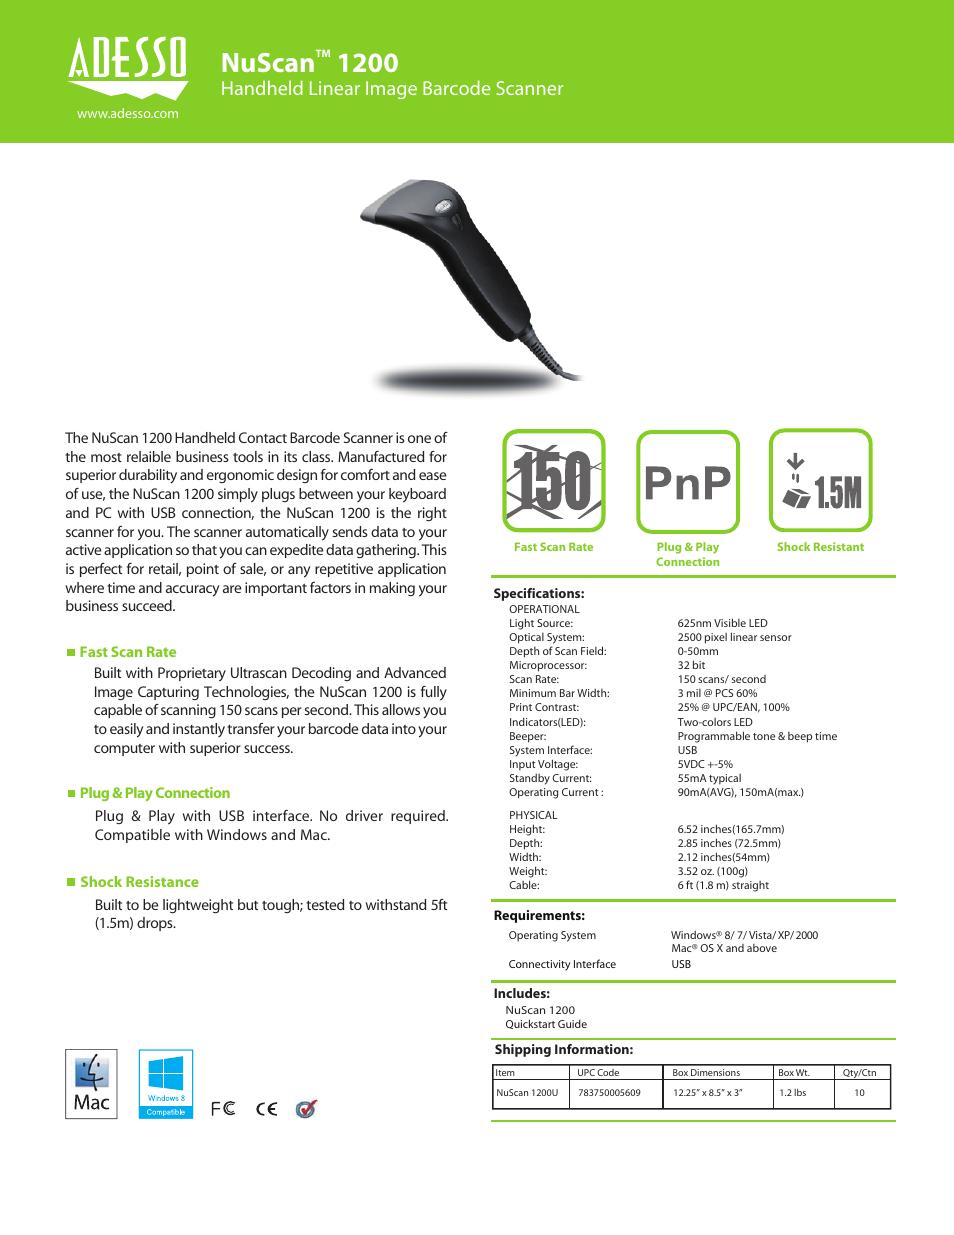 Adesso NuScan 1200U User Manual | 1 page